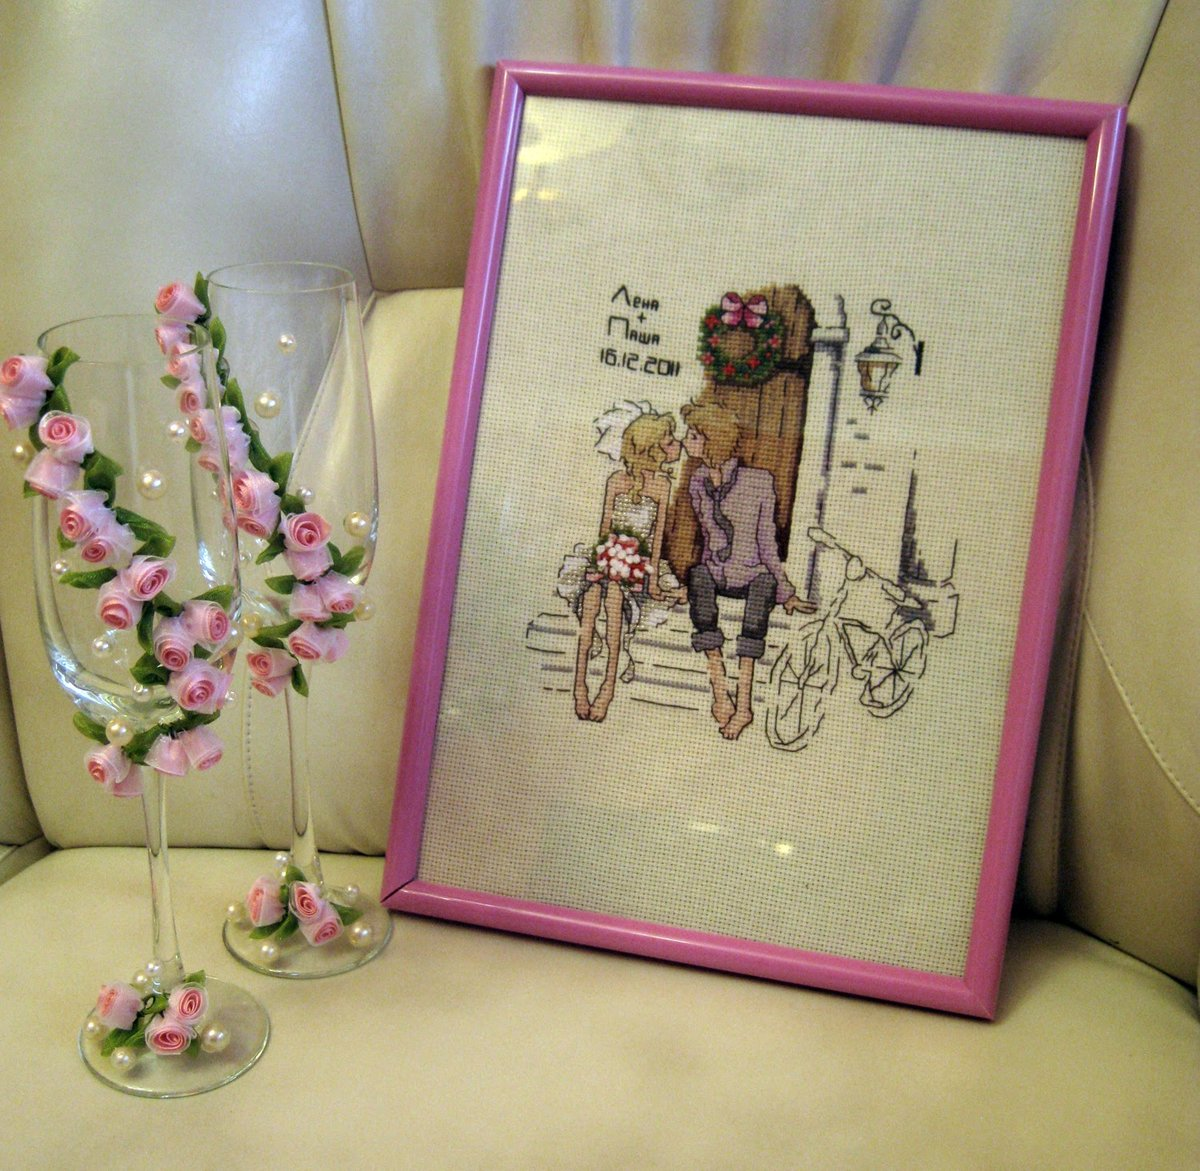 Оригинально подарить подарок на свадьбу креативно